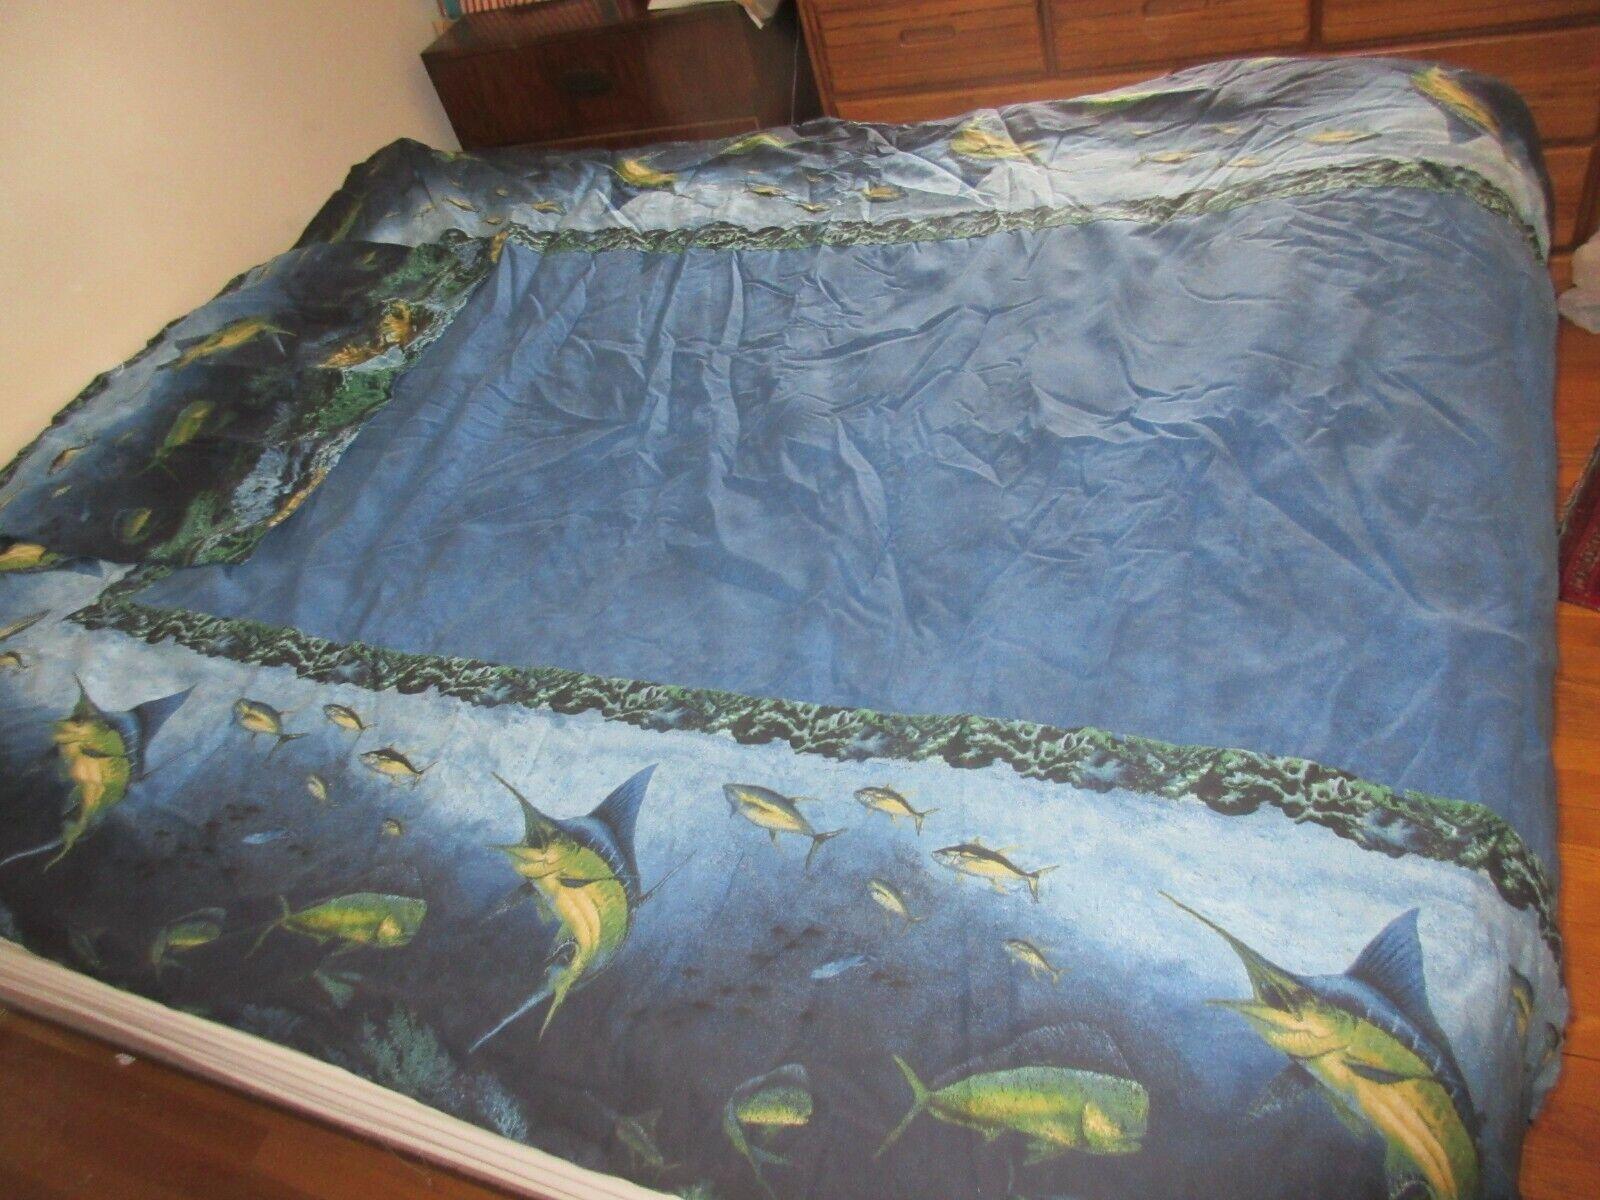 Marlin Ocean Fishing Deep Blau Bedspread Comforter & Pillow Sham Set Twin Größe